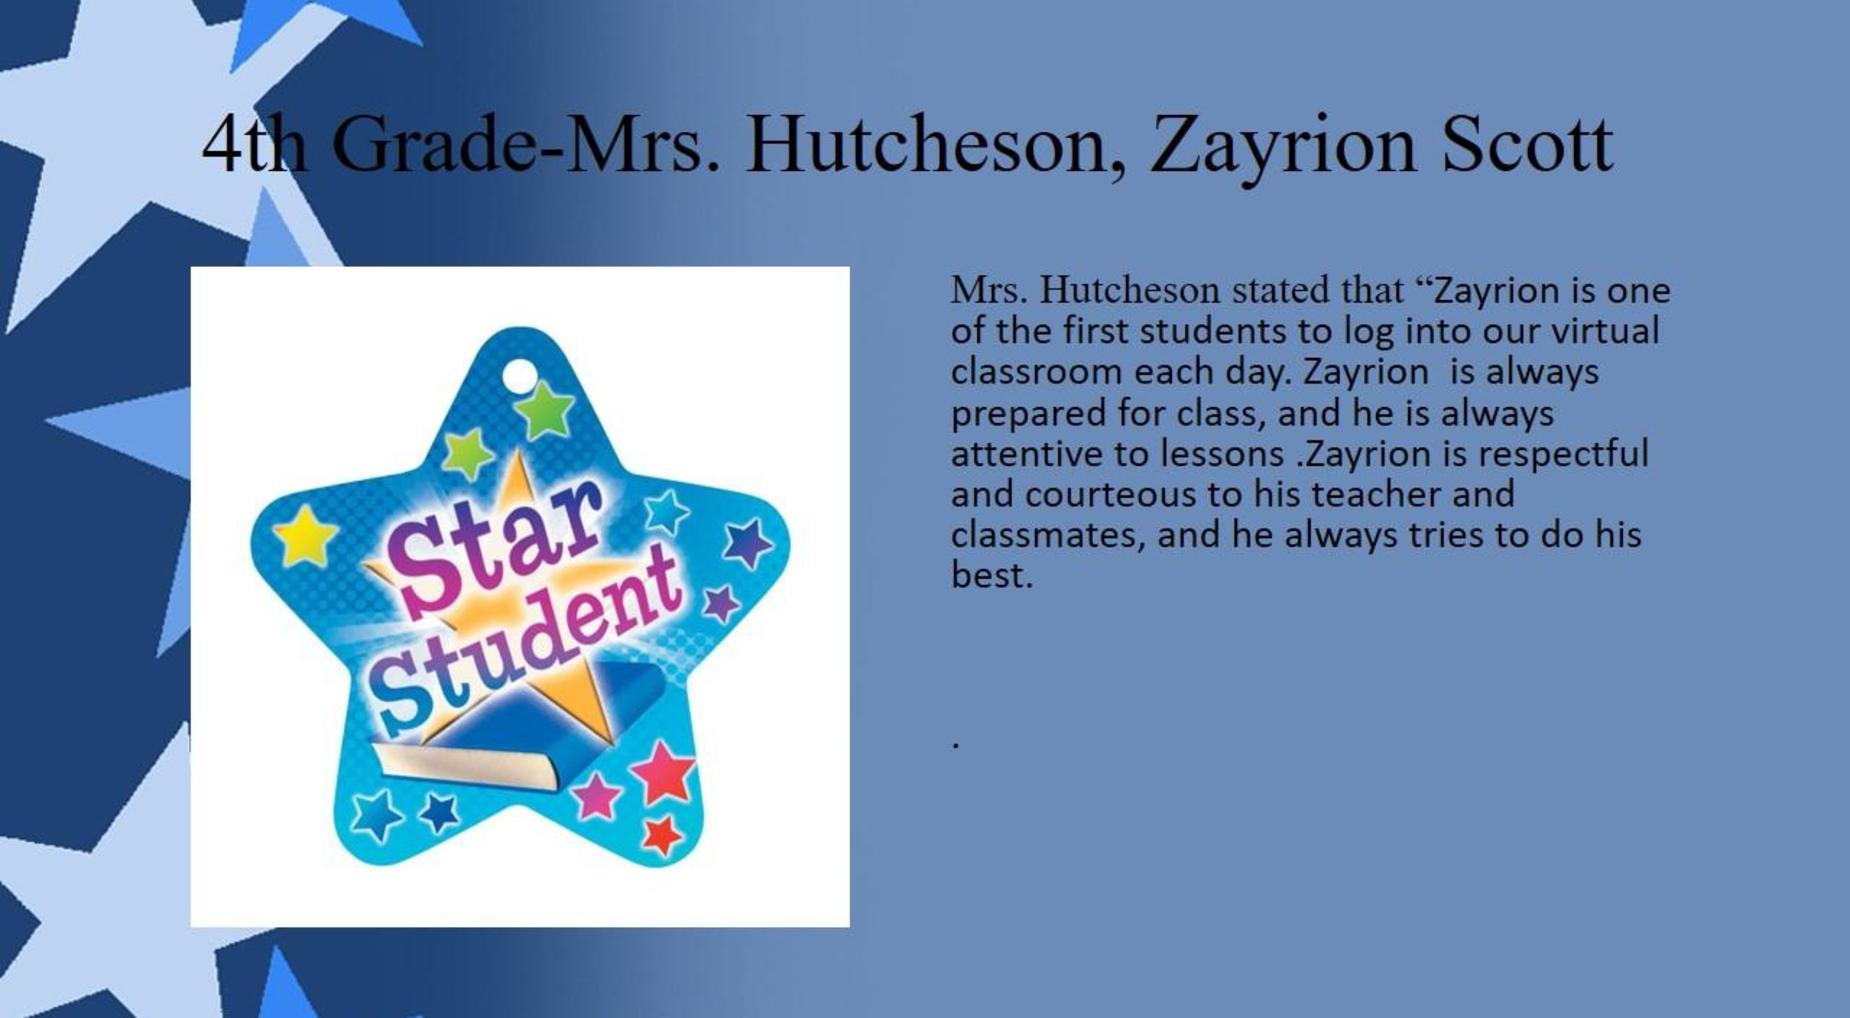 Zayrion Scott, 4th Grade